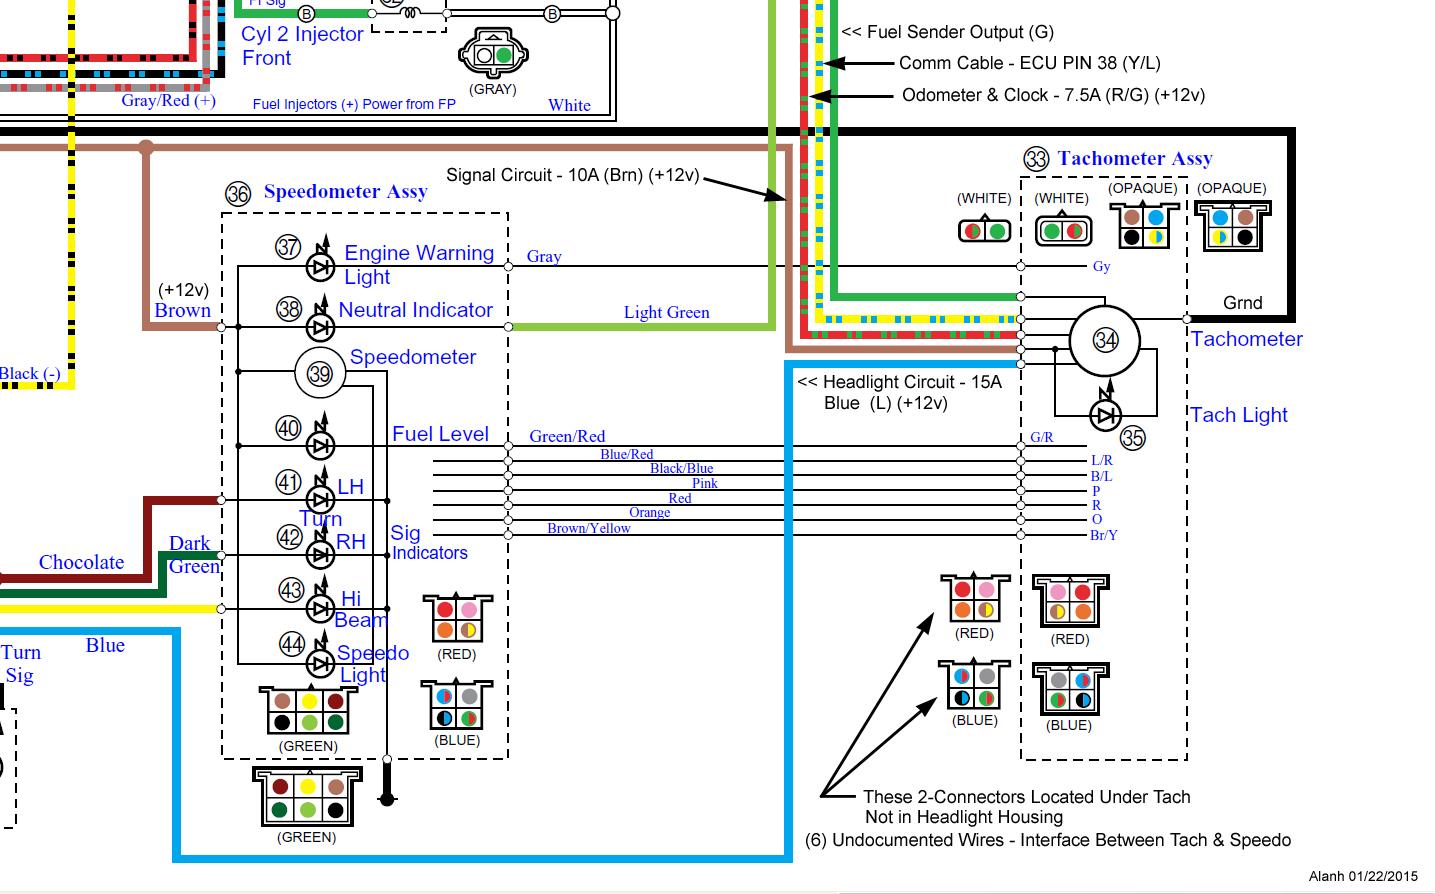 V Star Wiring Diagram | Schematic Diagram  Yamaha V Star Wiring Diagram on yamaha schematic diagram, kawasaki concours wiring diagram, honda shadow wiring diagram, suzuki intruder wiring diagram, kawasaki vulcan wiring diagram, suzuki sv650 wiring diagram, yamaha v star coil, yamaha v star oil filter, yamaha v star shock absorber, yamaha v star exhaust, silverado wiring diagram, western star fuse diagram, roadstar wiring diagram, bmw f650 wiring diagram, yamaha v star parts, triumph thunderbird wiring diagram, triumph speed triple wiring diagram, honda magna wiring diagram, victory cross country wiring diagram, ducati wiring diagram,